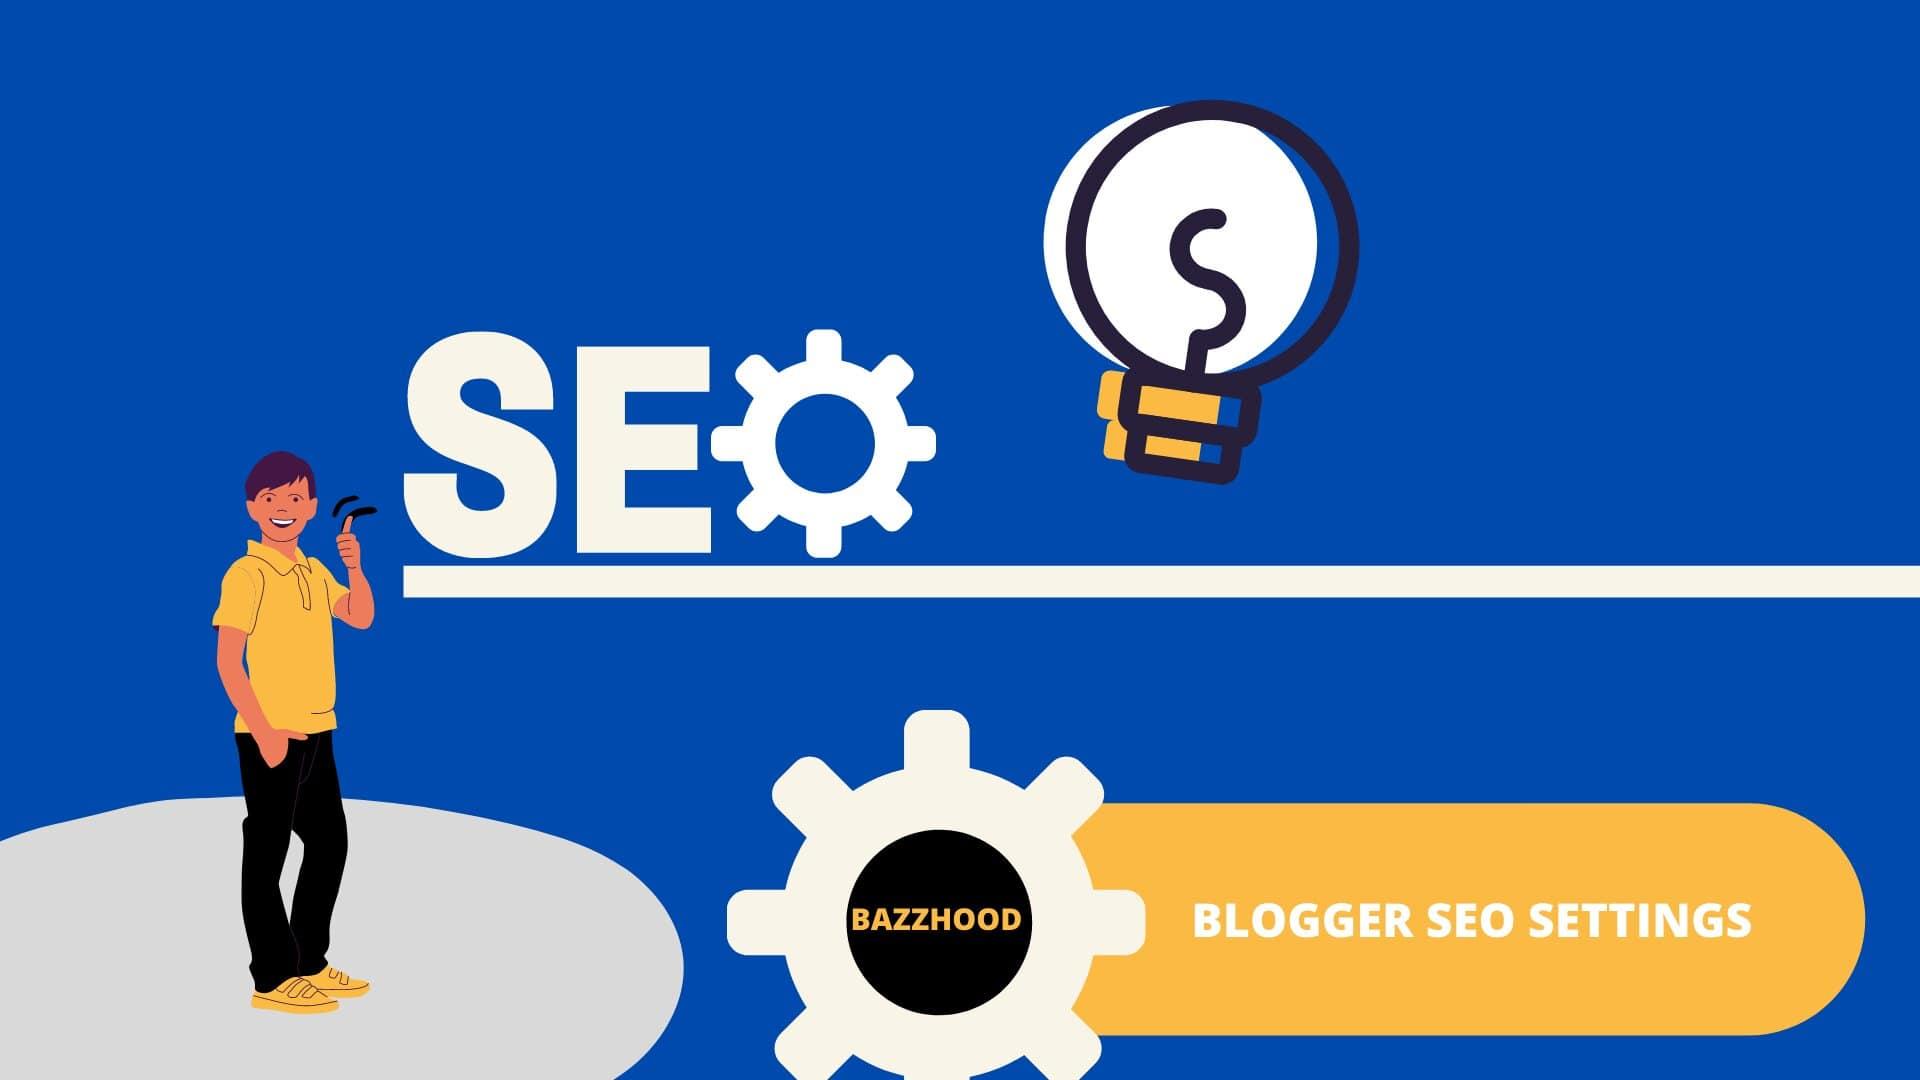 BlogSpot SEO Settings for Beginners Bloggers